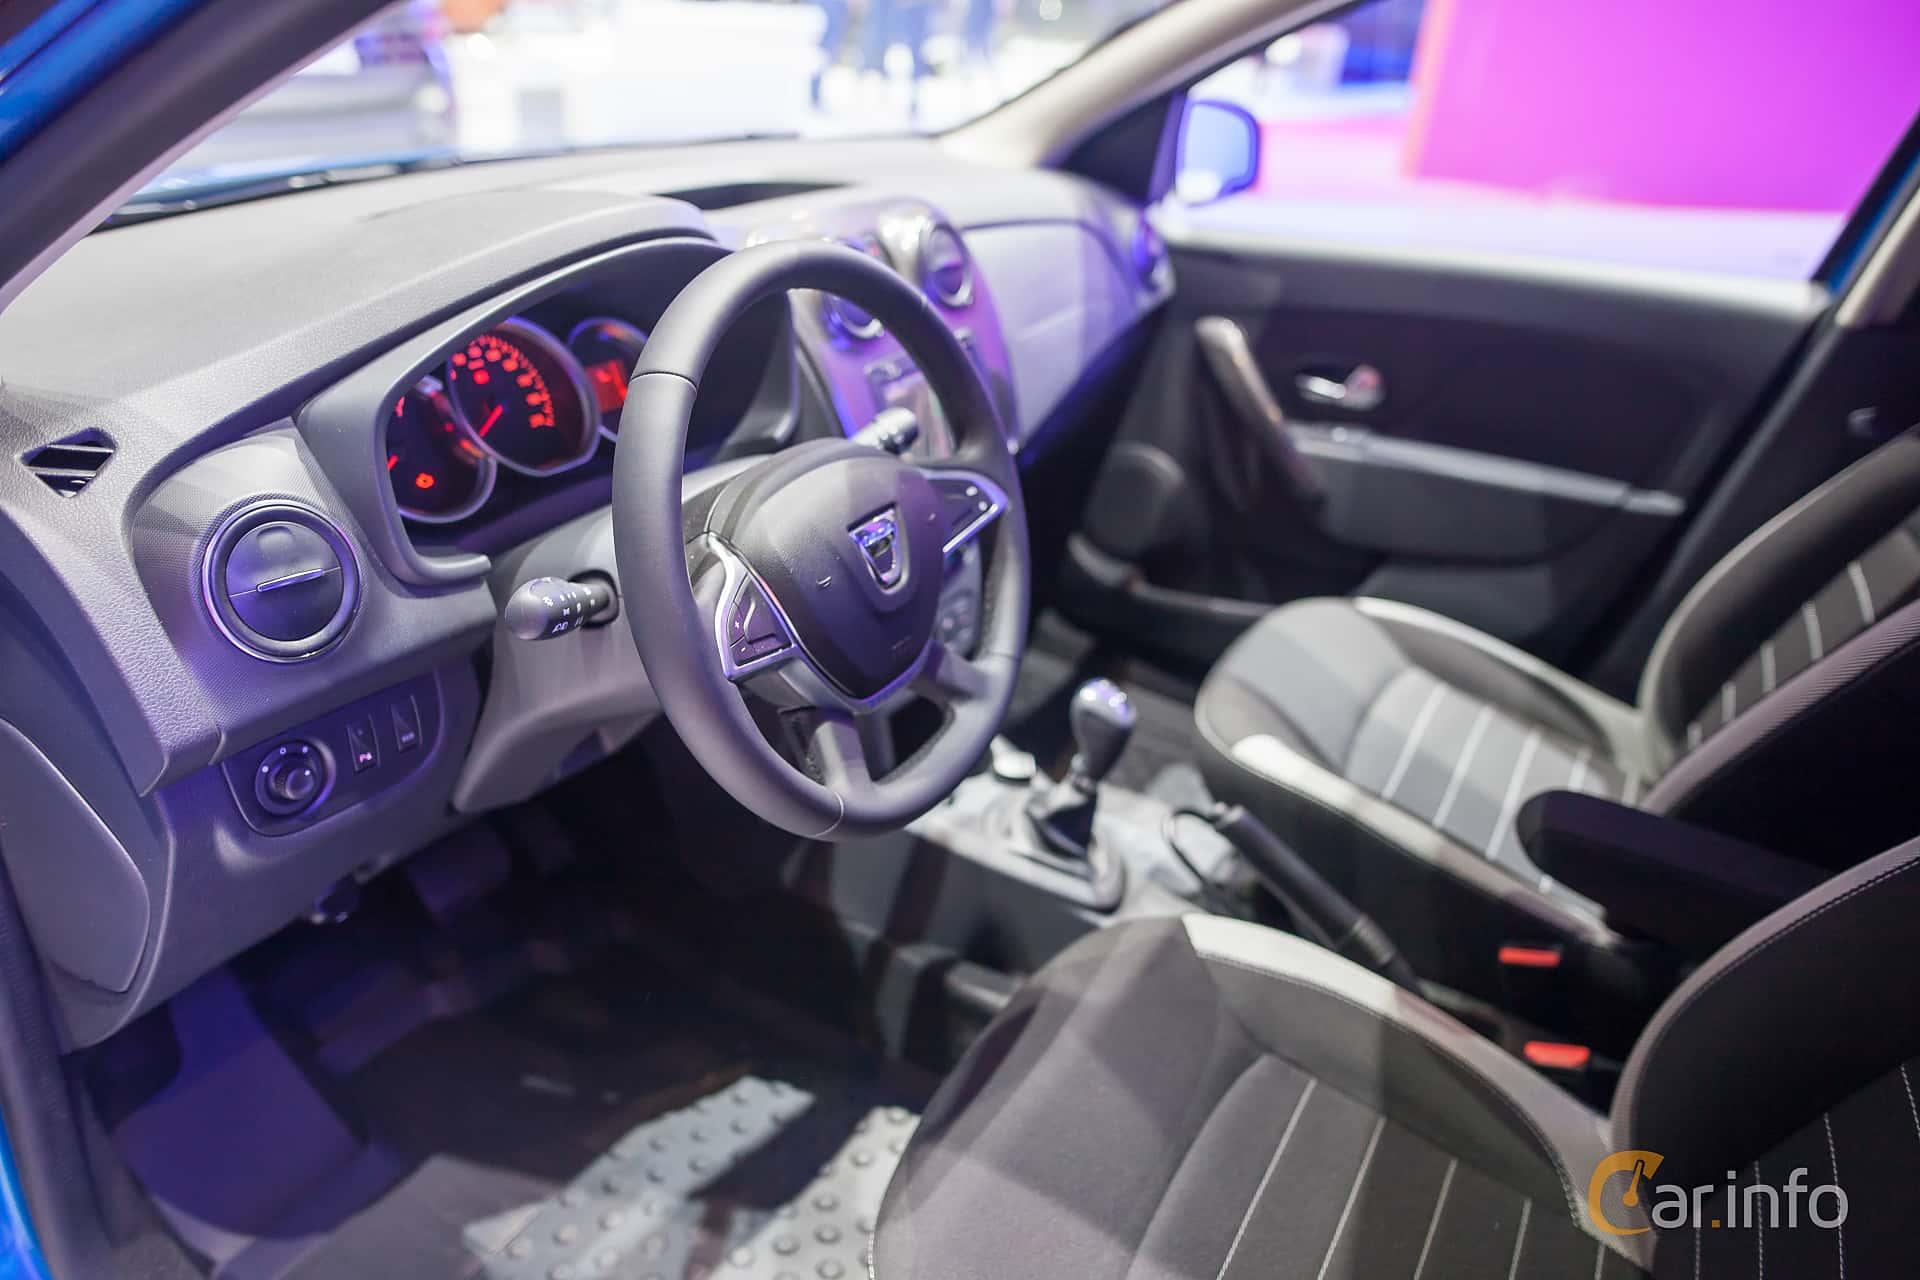 Dacia Sandero Stepway 1.5 dCi Automatic, 90hp, 2017